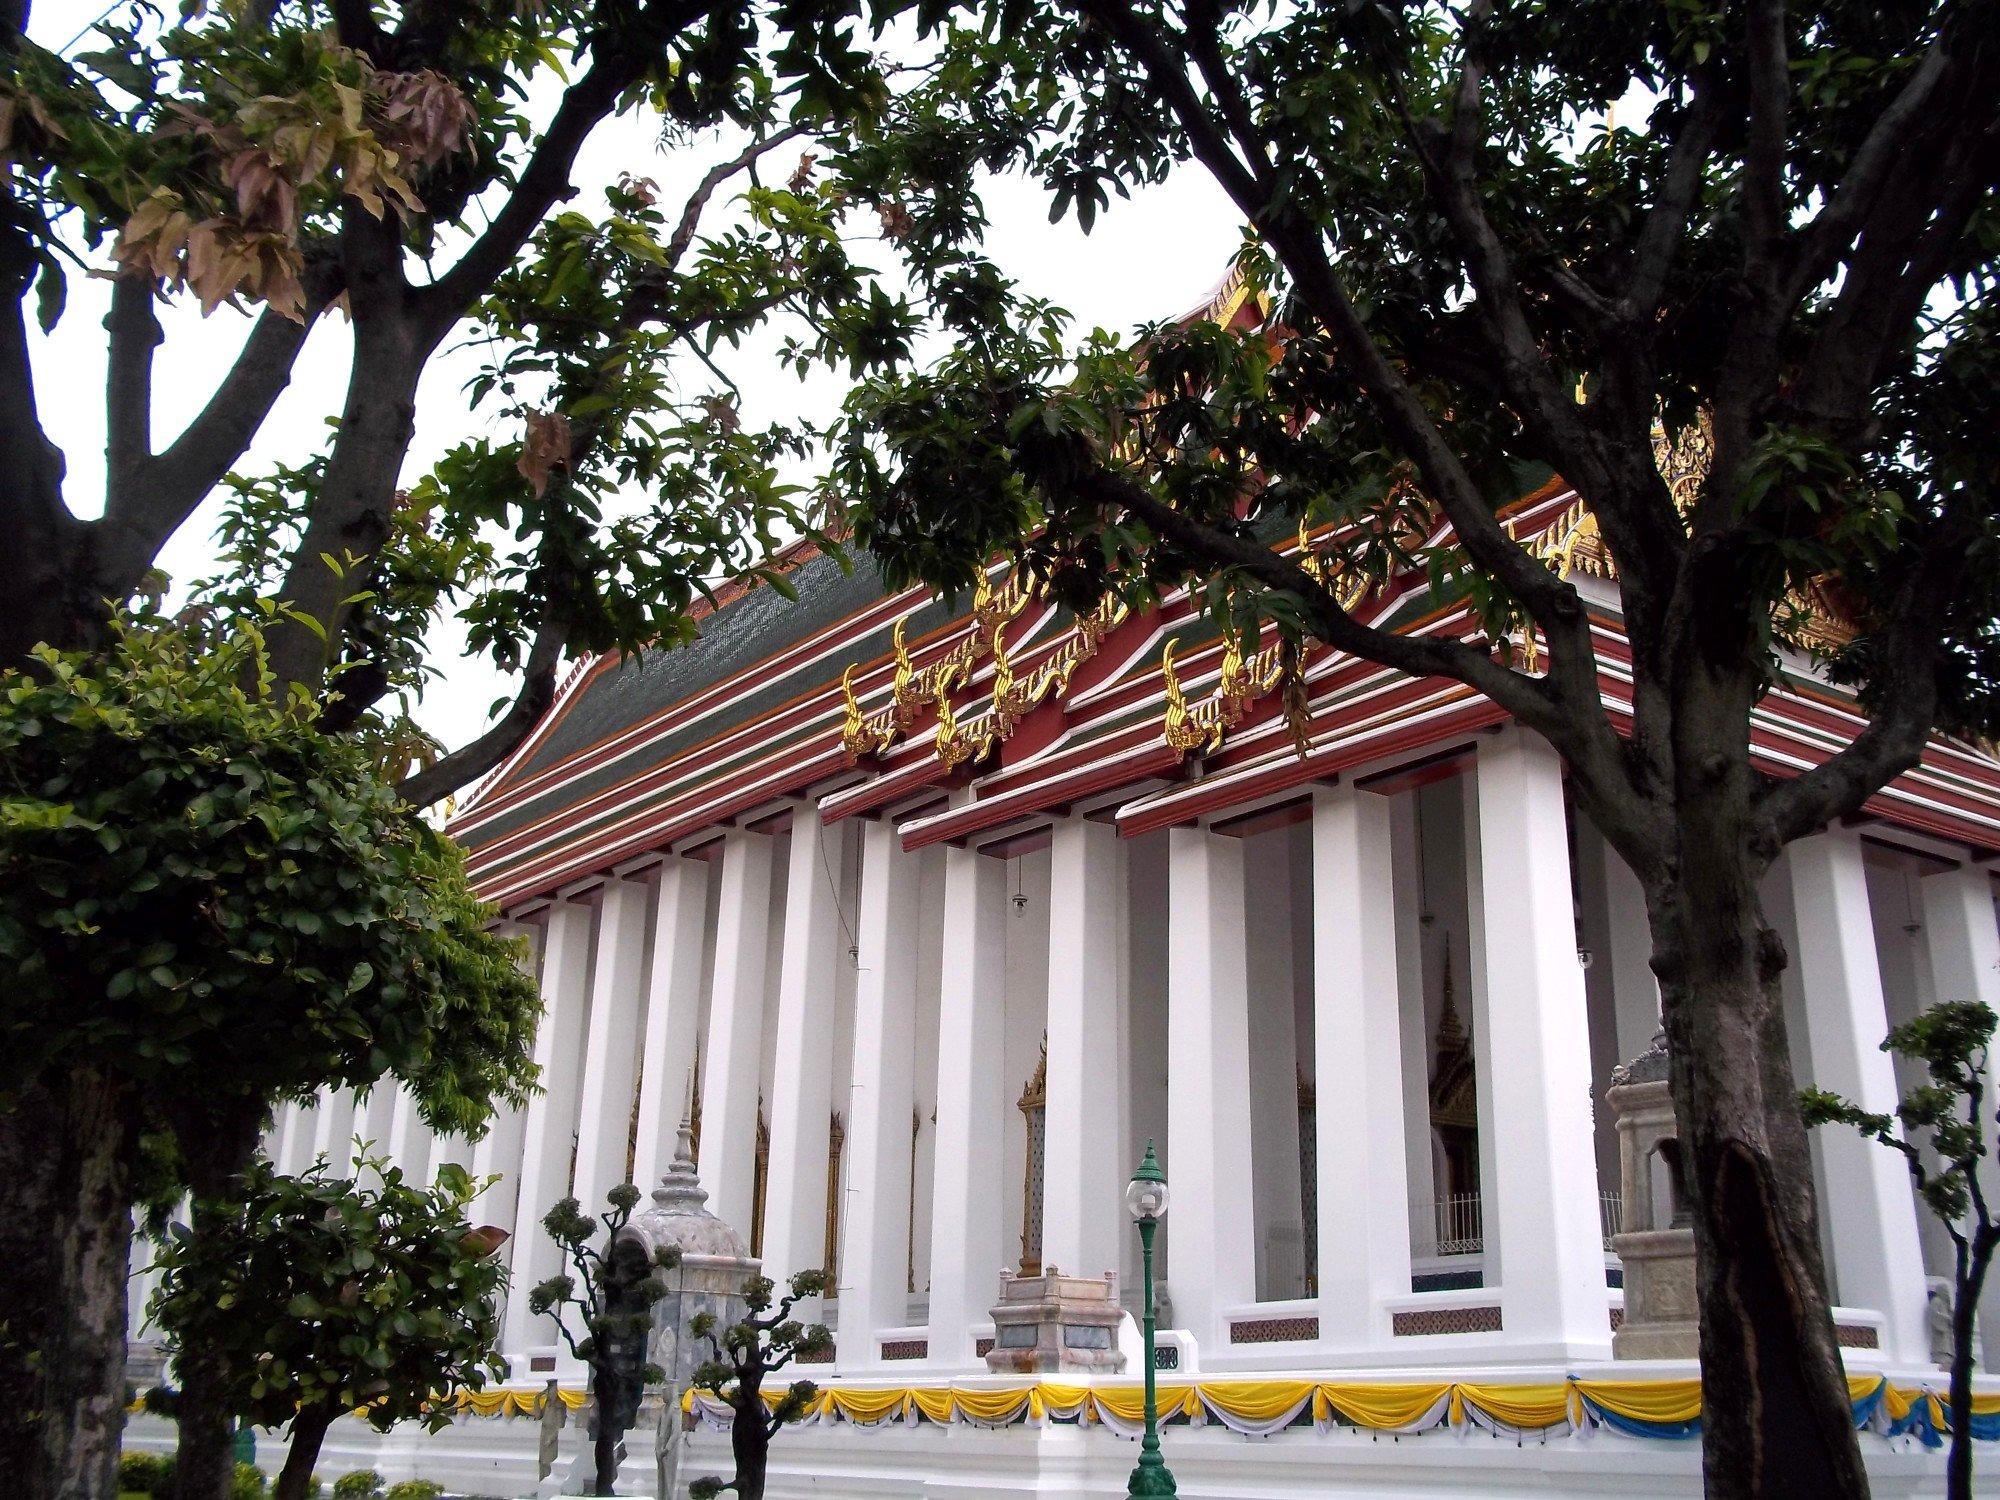 Ordination Hall at Wat Suthat Thepwararam